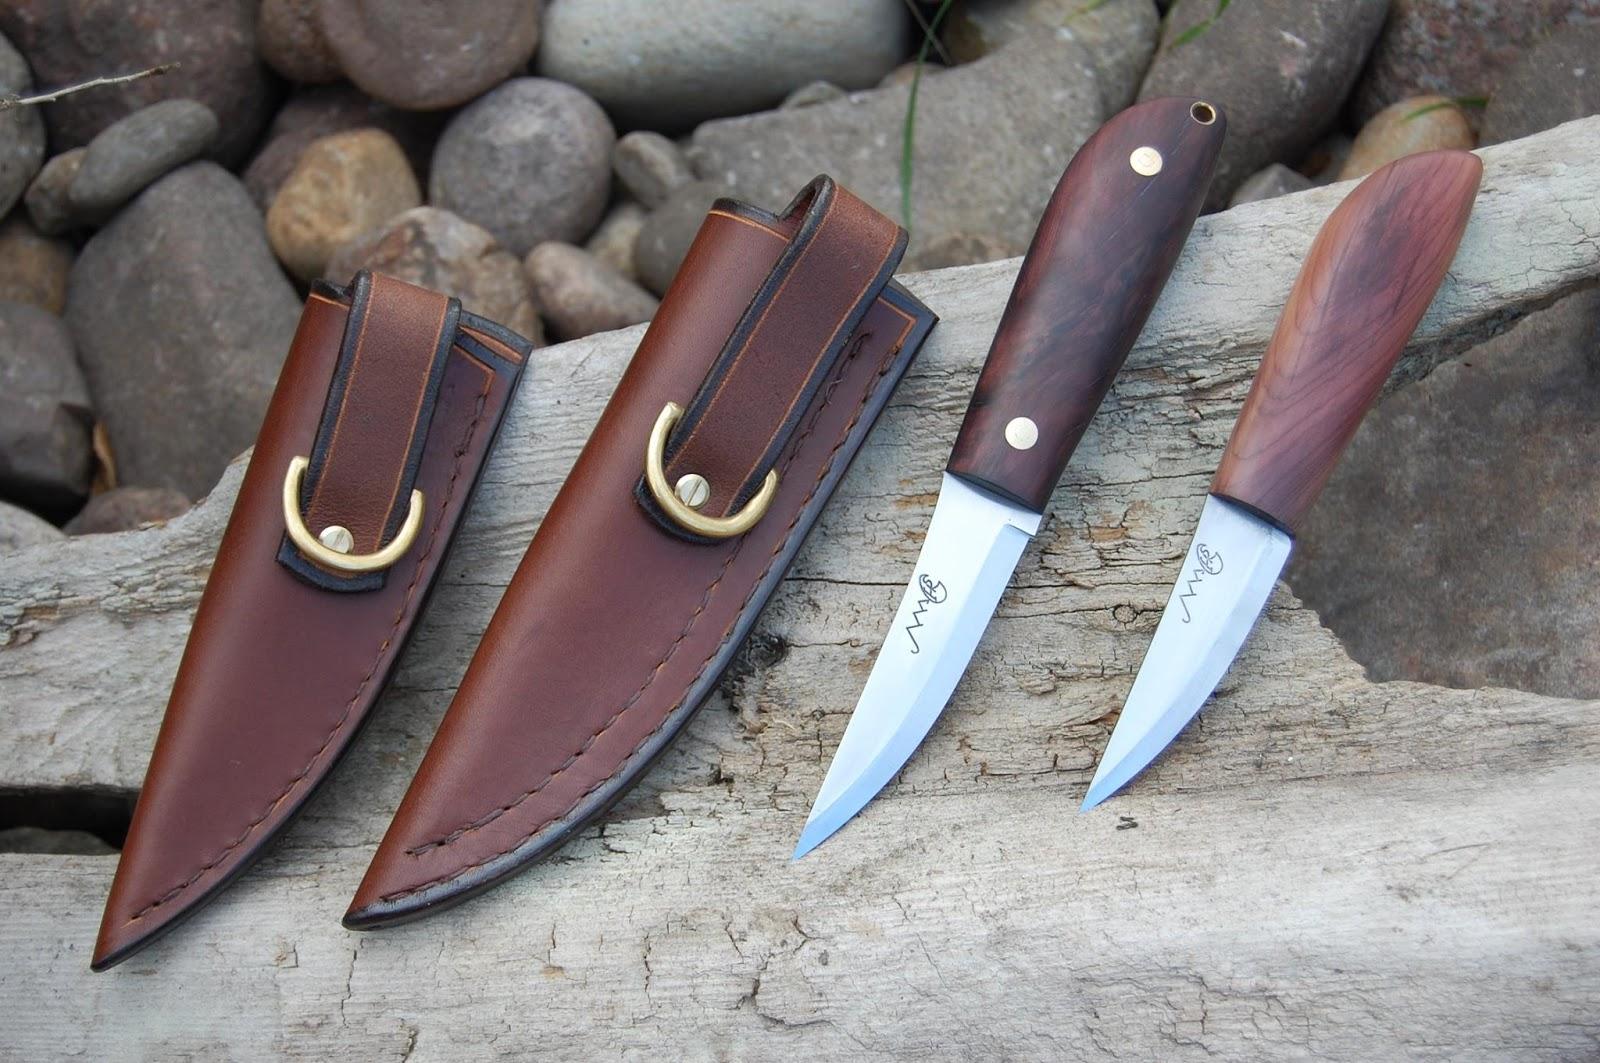 spooncarving knife+machris spoon carving knife